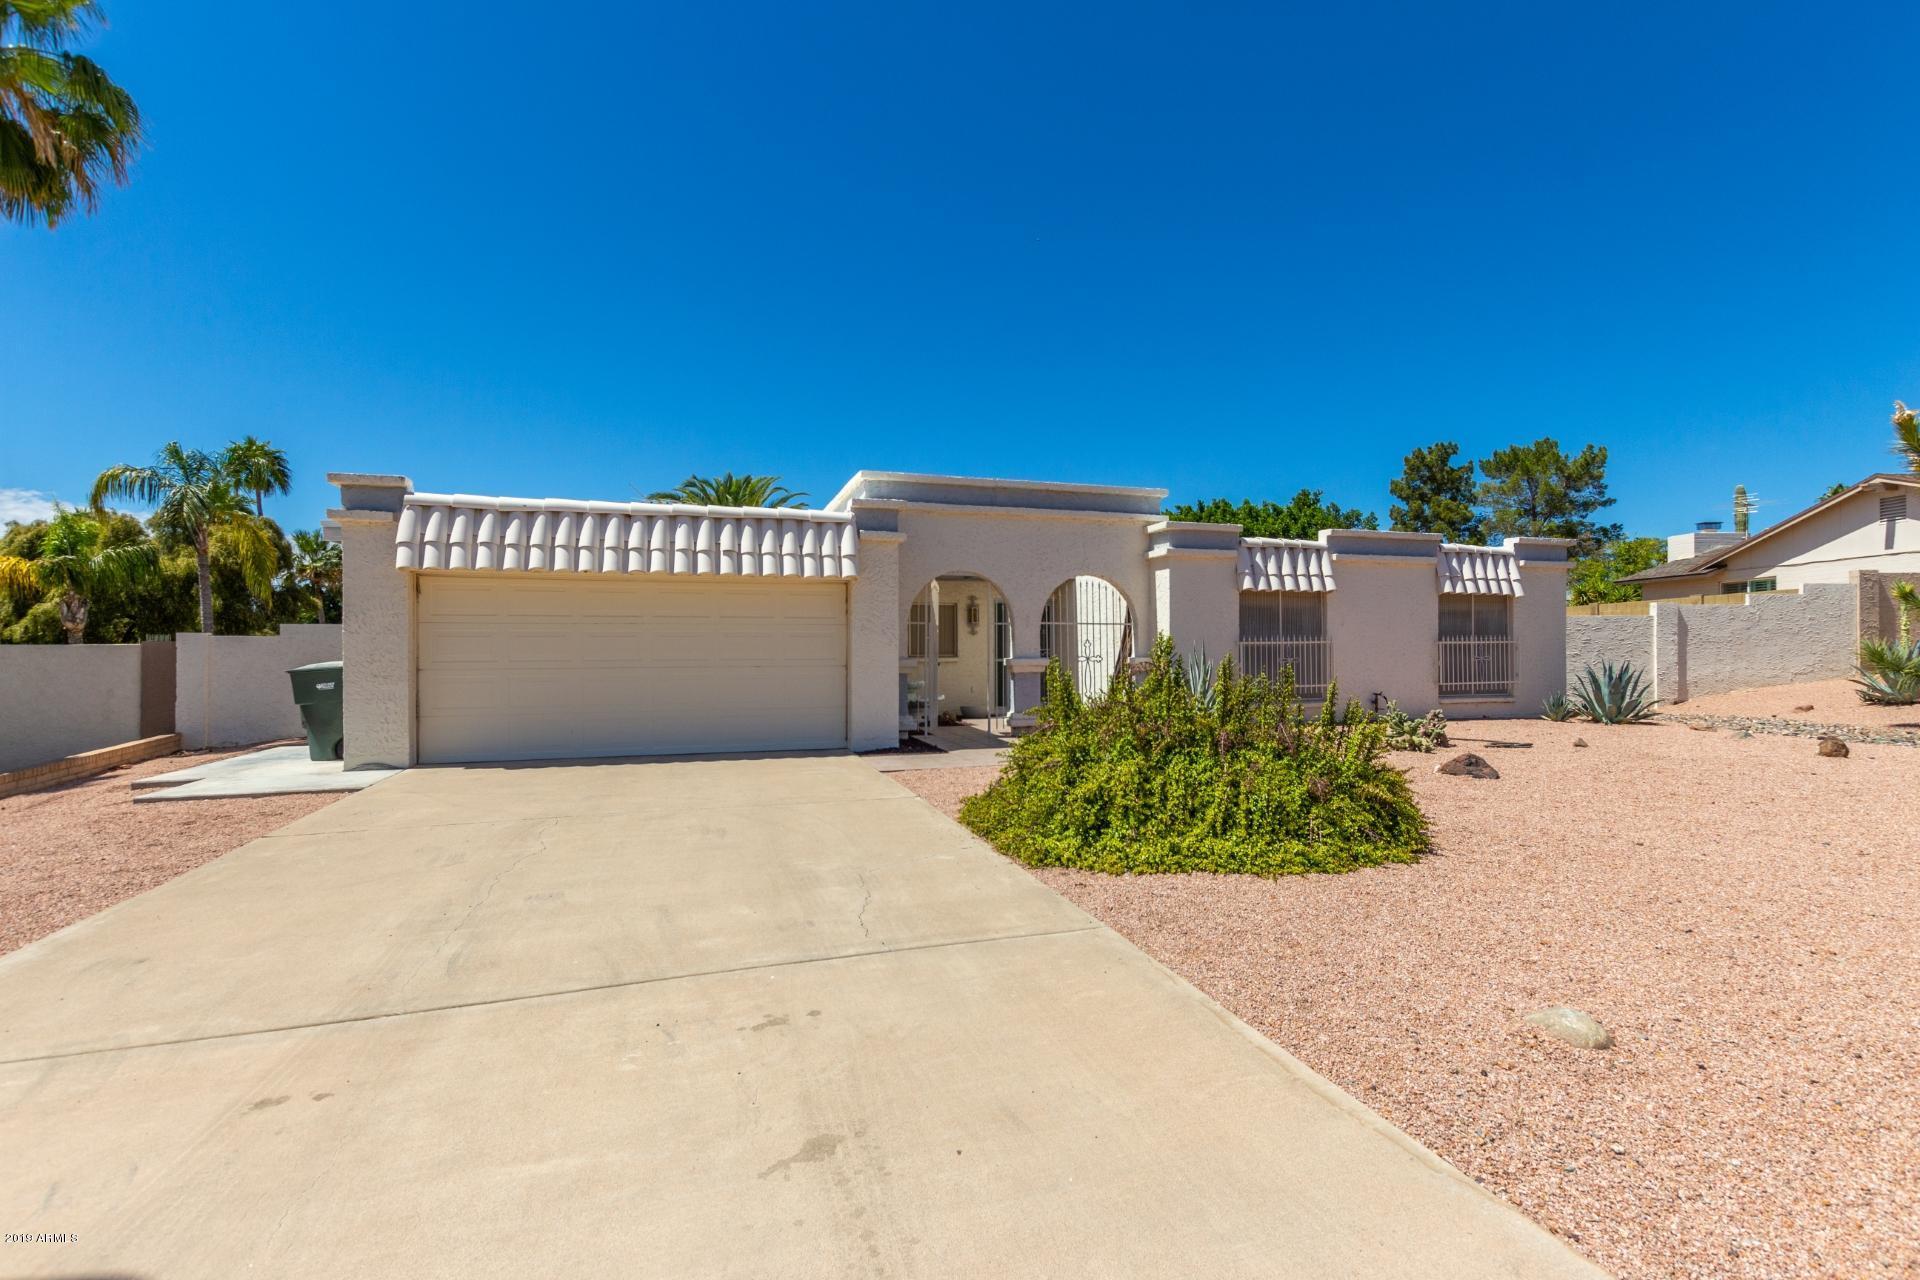 Photo of 15030 N 8TH Way, Phoenix, AZ 85022